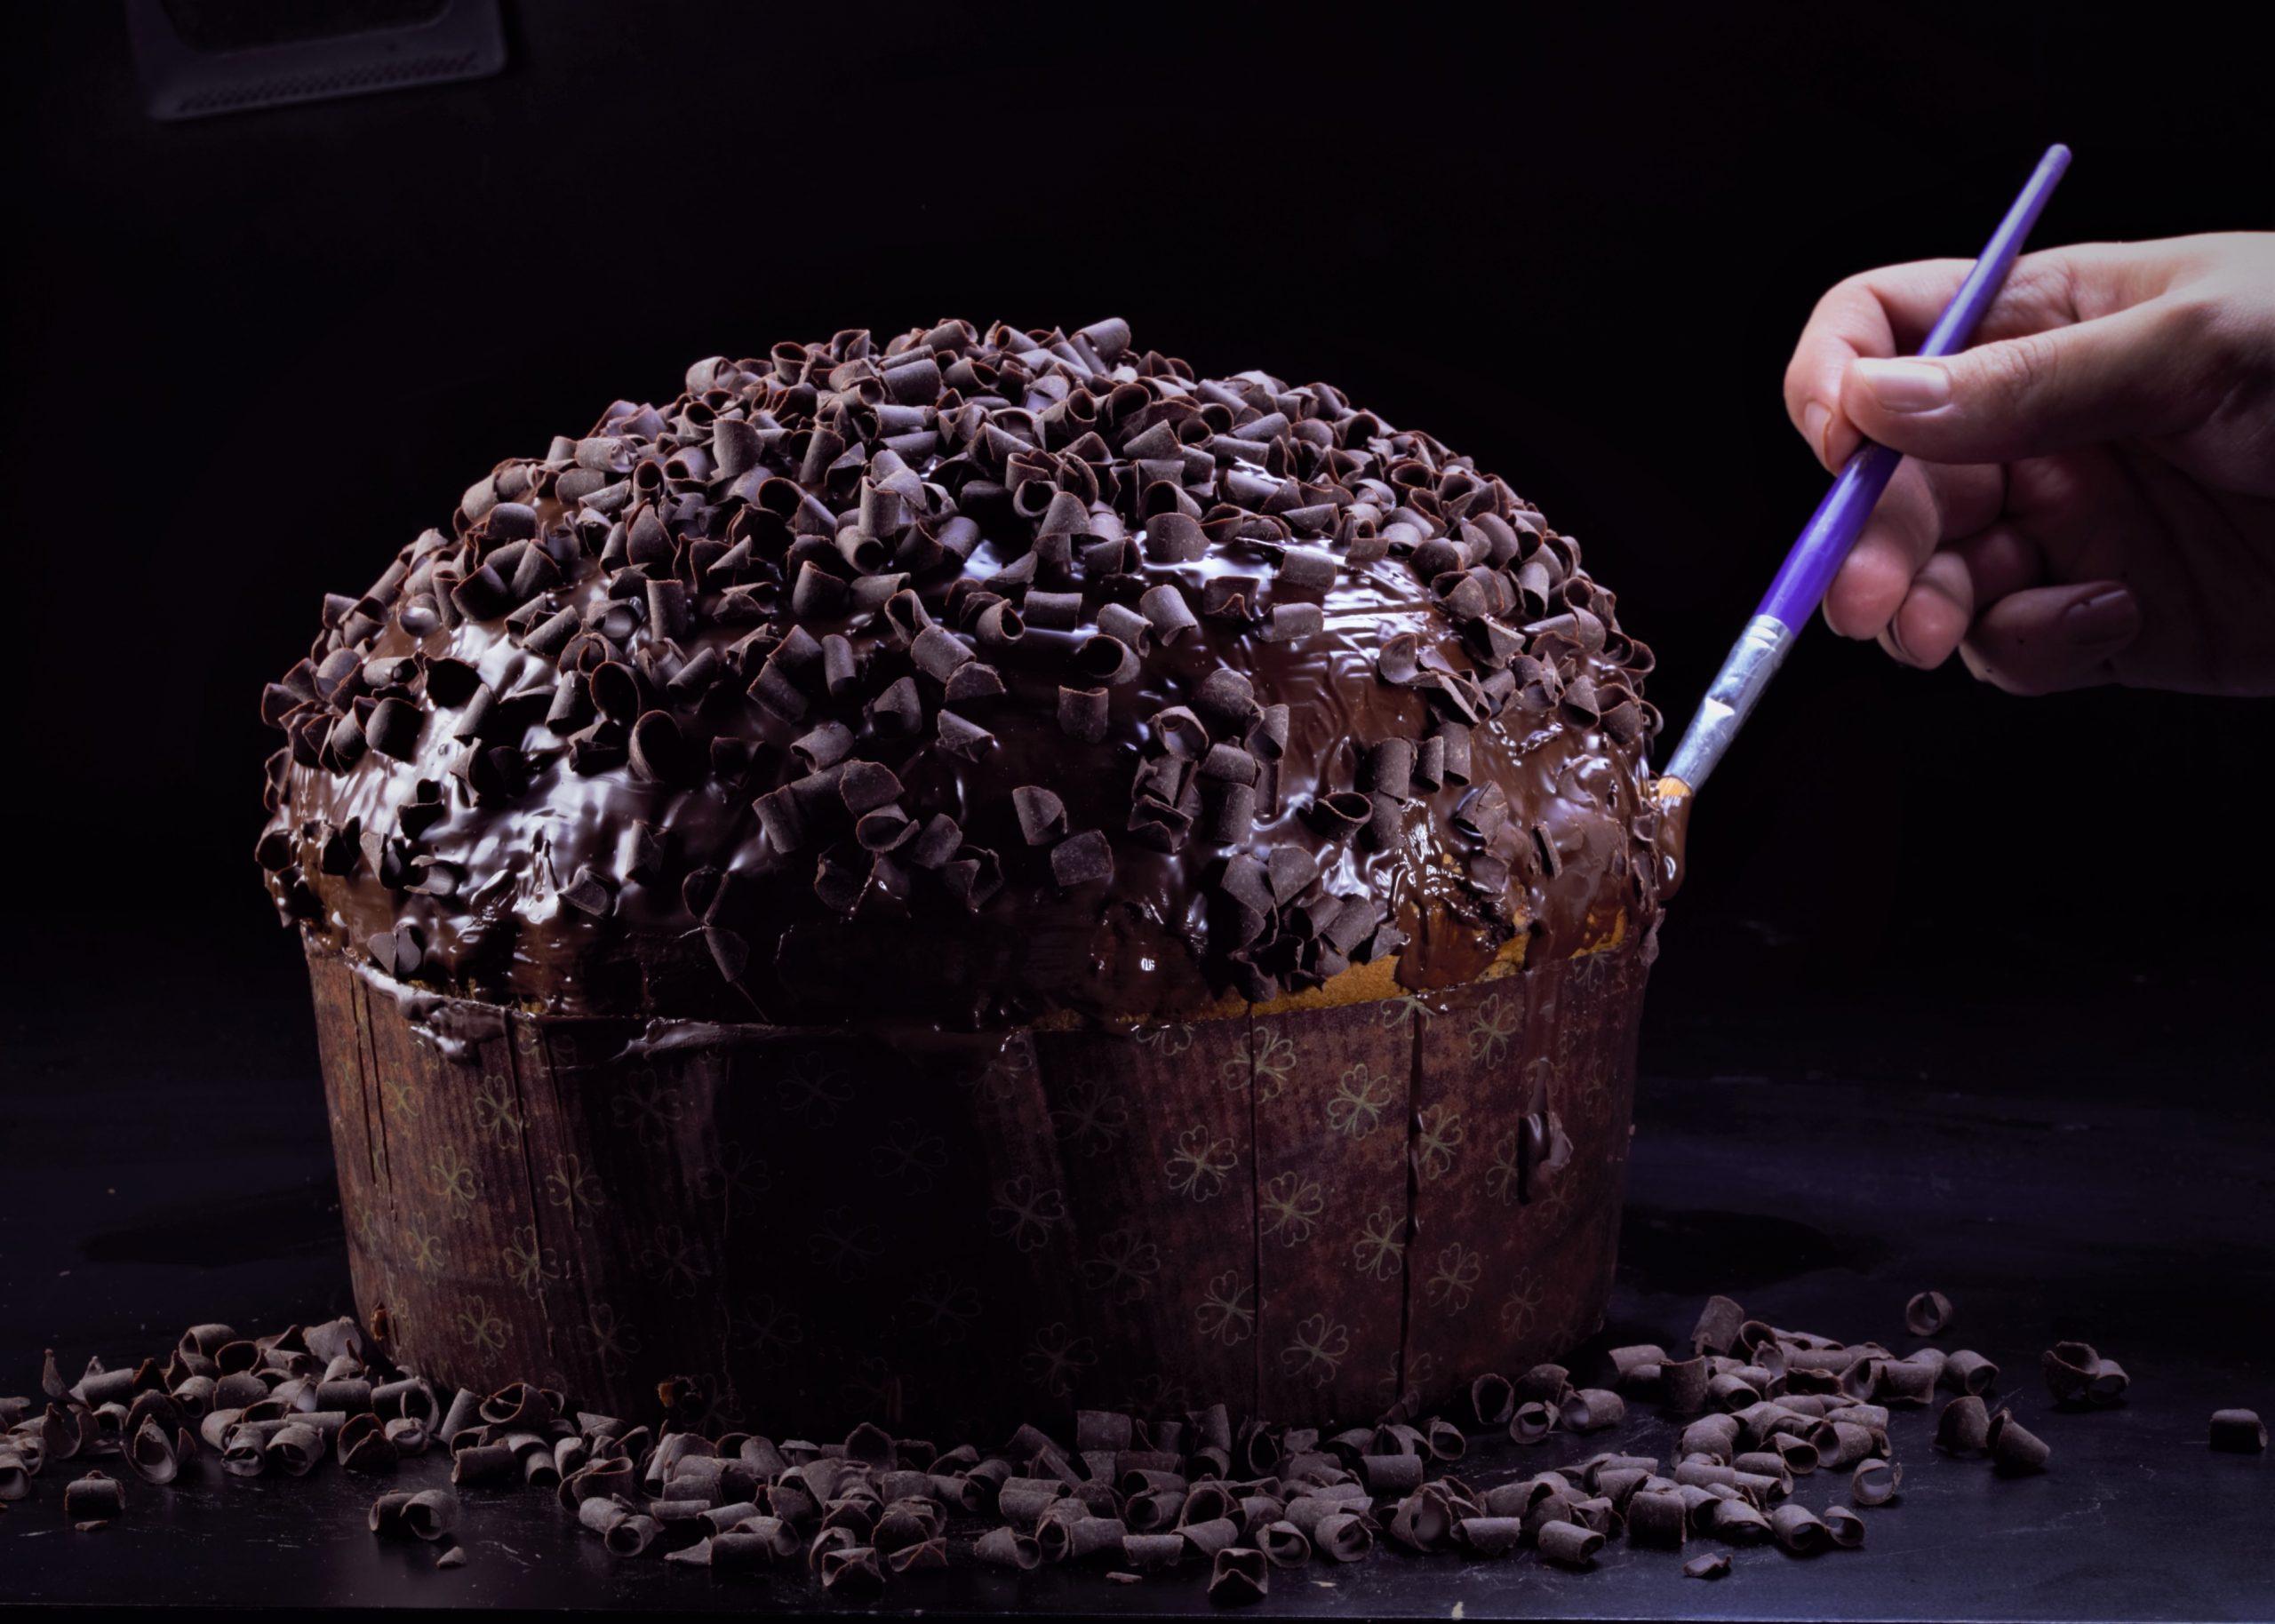 https://www.animadolce.it/wp-content/uploads/2020/10/panettone-cioccolato-scaled.jpg